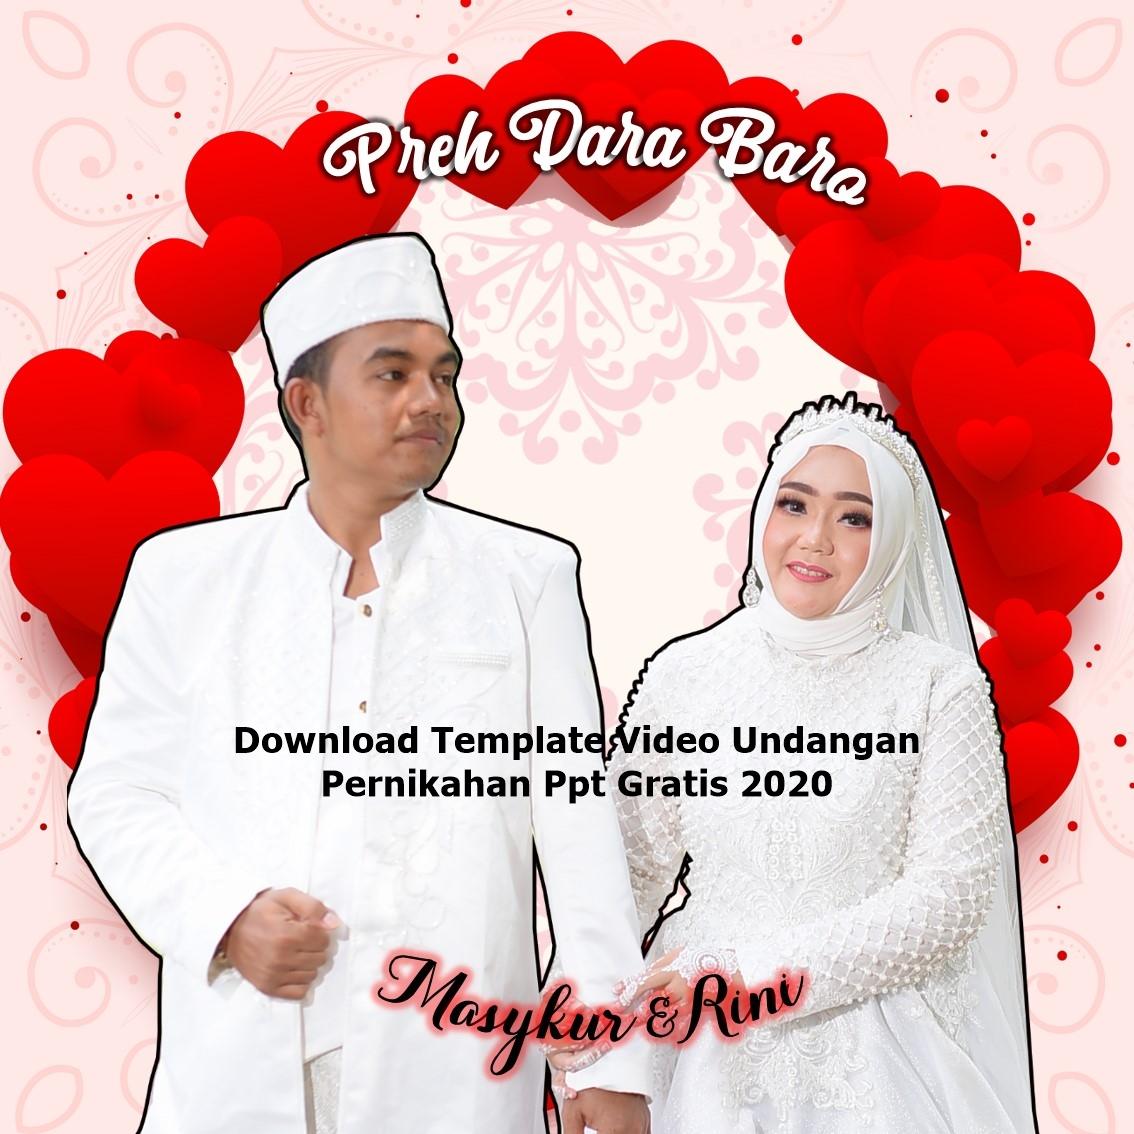 Template Video Undangan Pernikahan Powerpoint Gratis Goresan